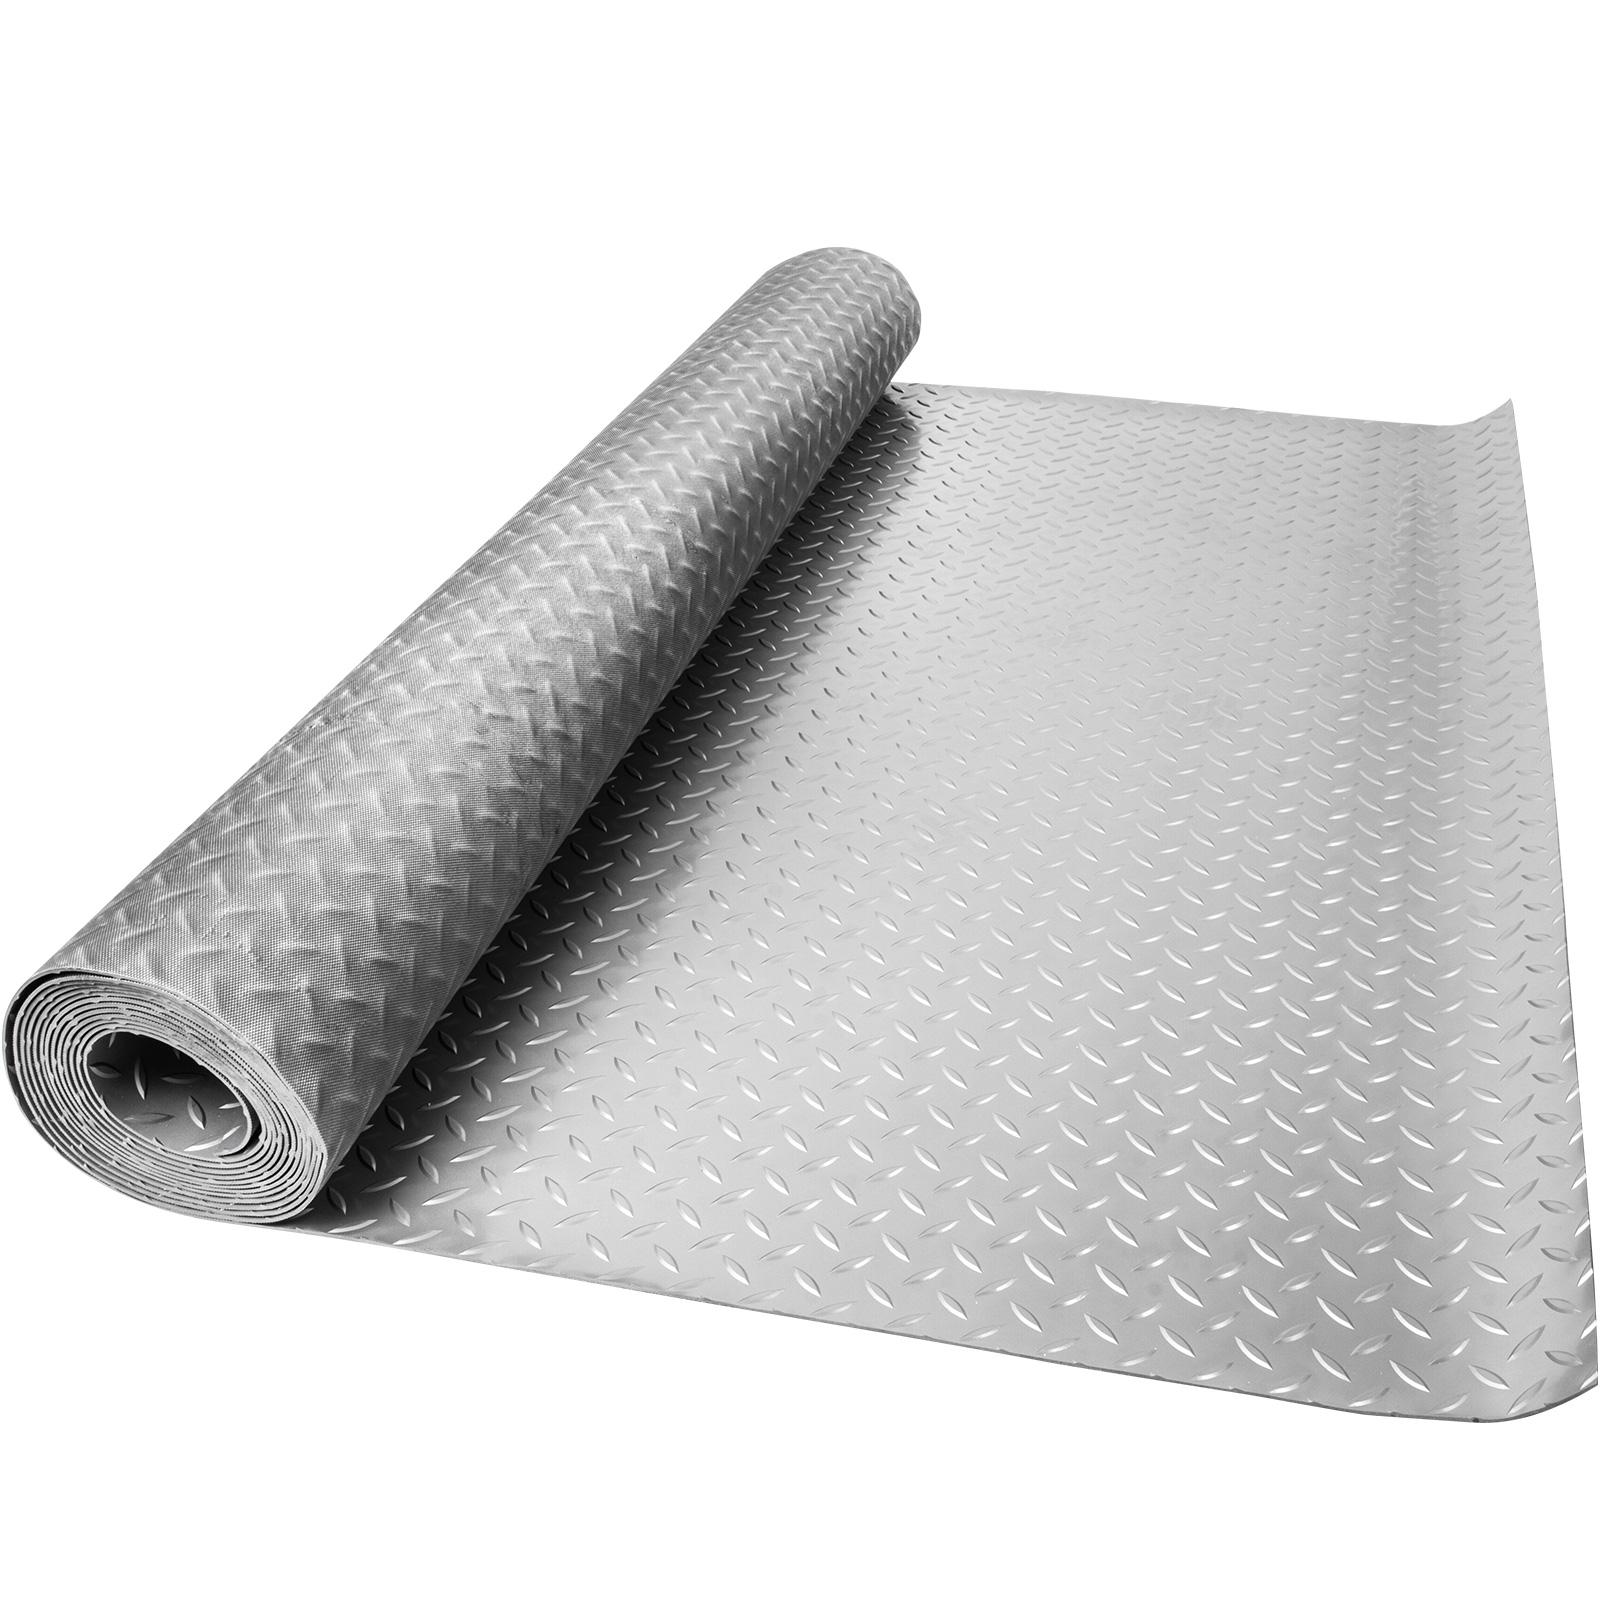 thumbnail 71 - Garage Flooring Mat Roll Car Trailer Floor Covering 1.1m Width Gym Floor Roll